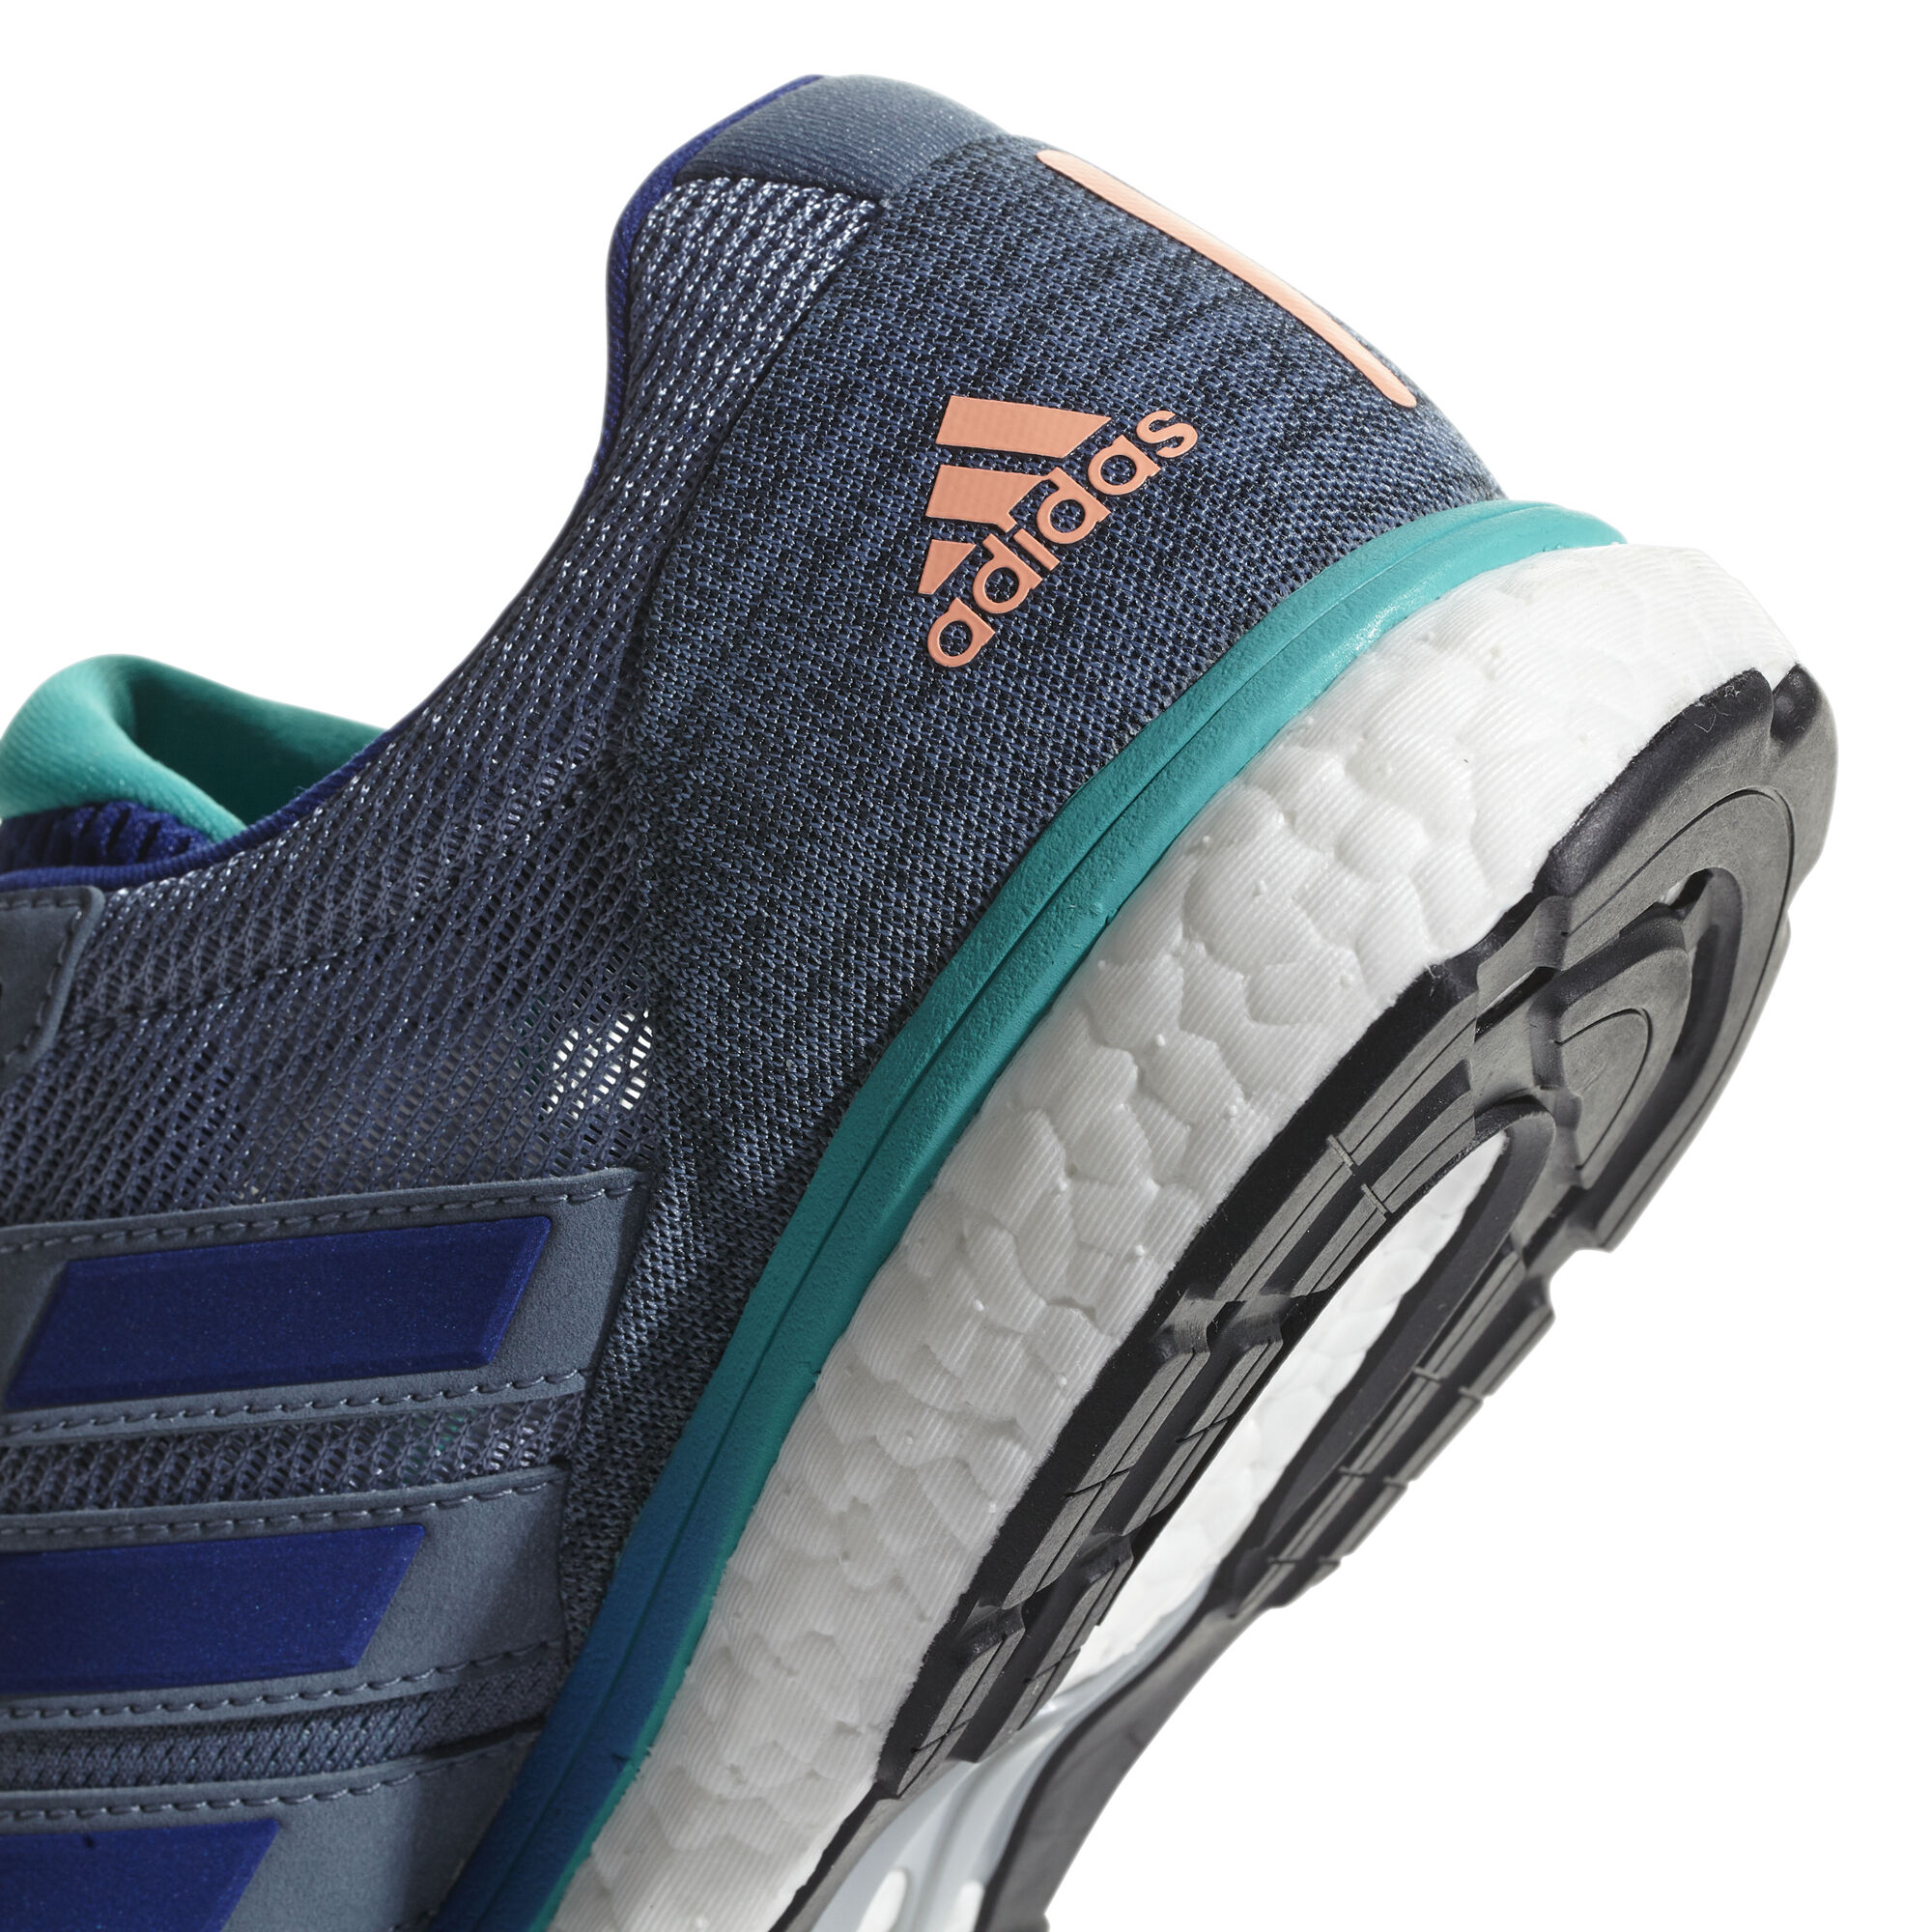 the latest b26c5 6f268 ... adidas · adidas · adidas · adidas. Adizero Boston 7 ...